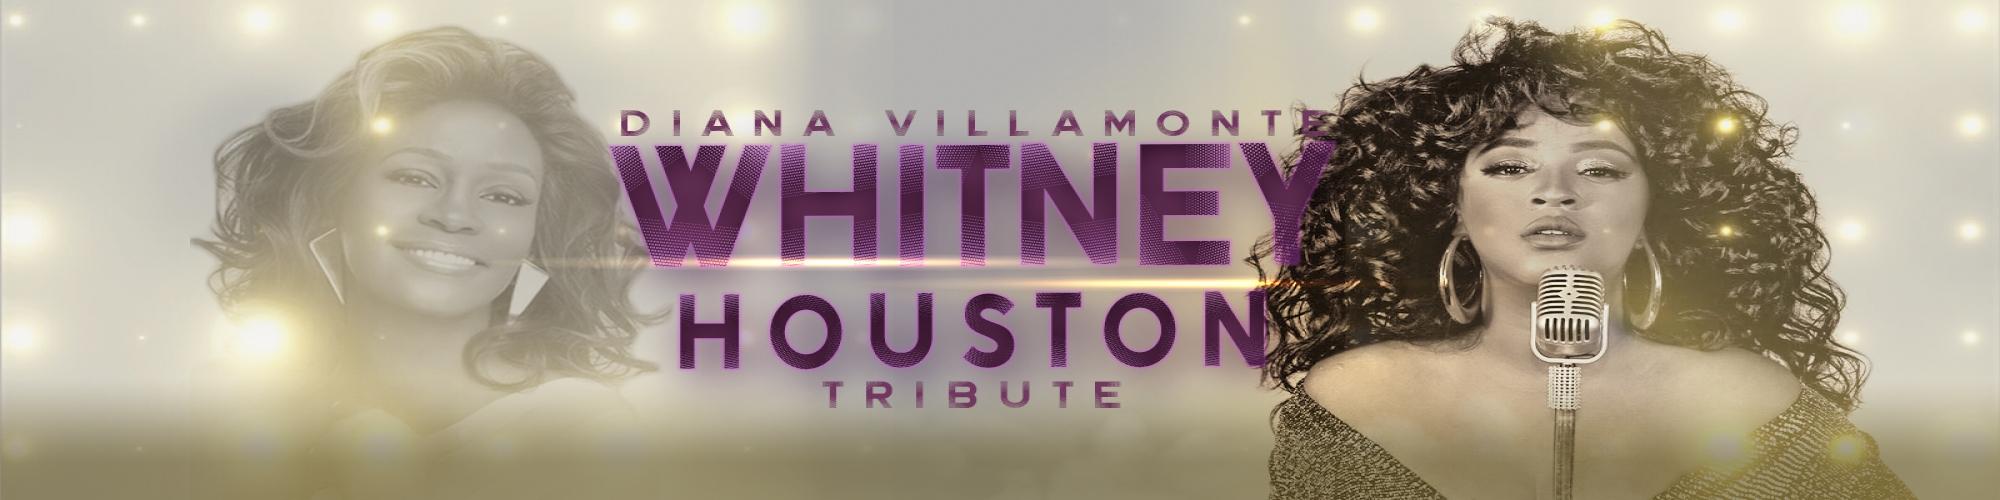 WHITNEY HOUSTON - starring Diana Villamonte (Main Stage)